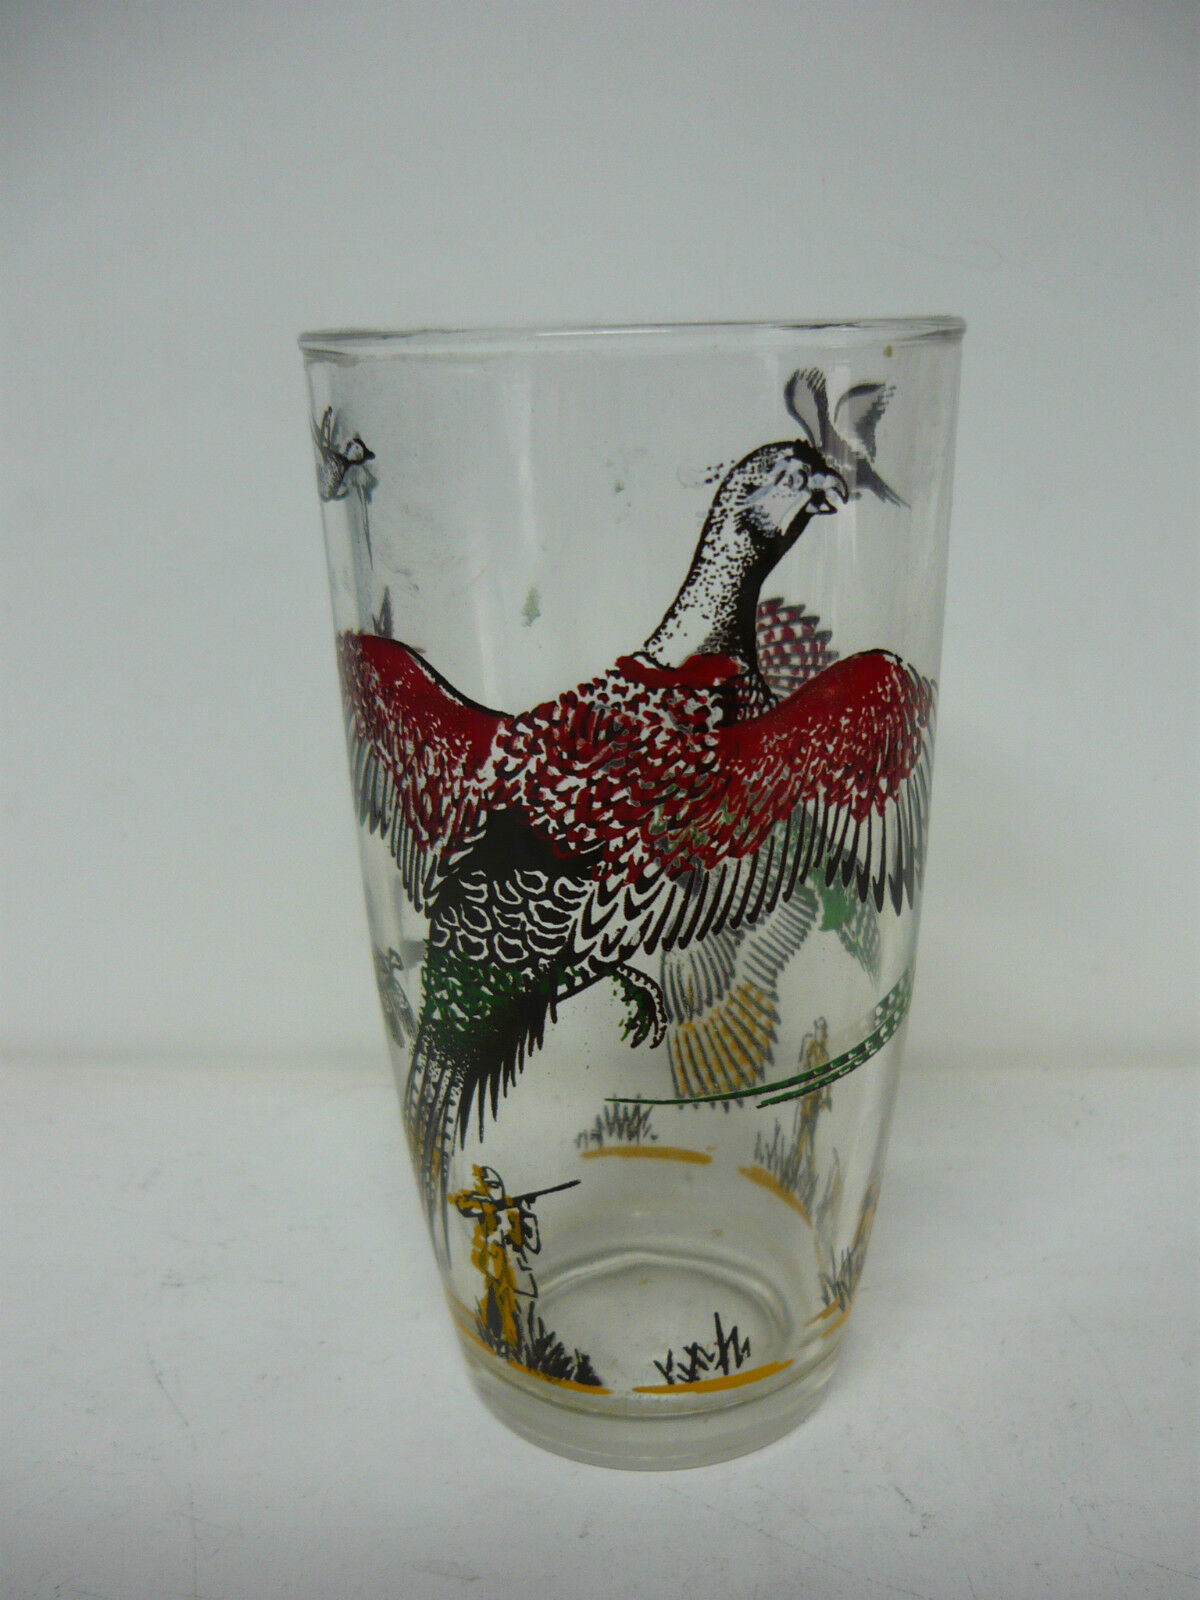 Vintage HAZEL ATLAS PHEASANT HUNTING GLASS BEER BAR DRINKING